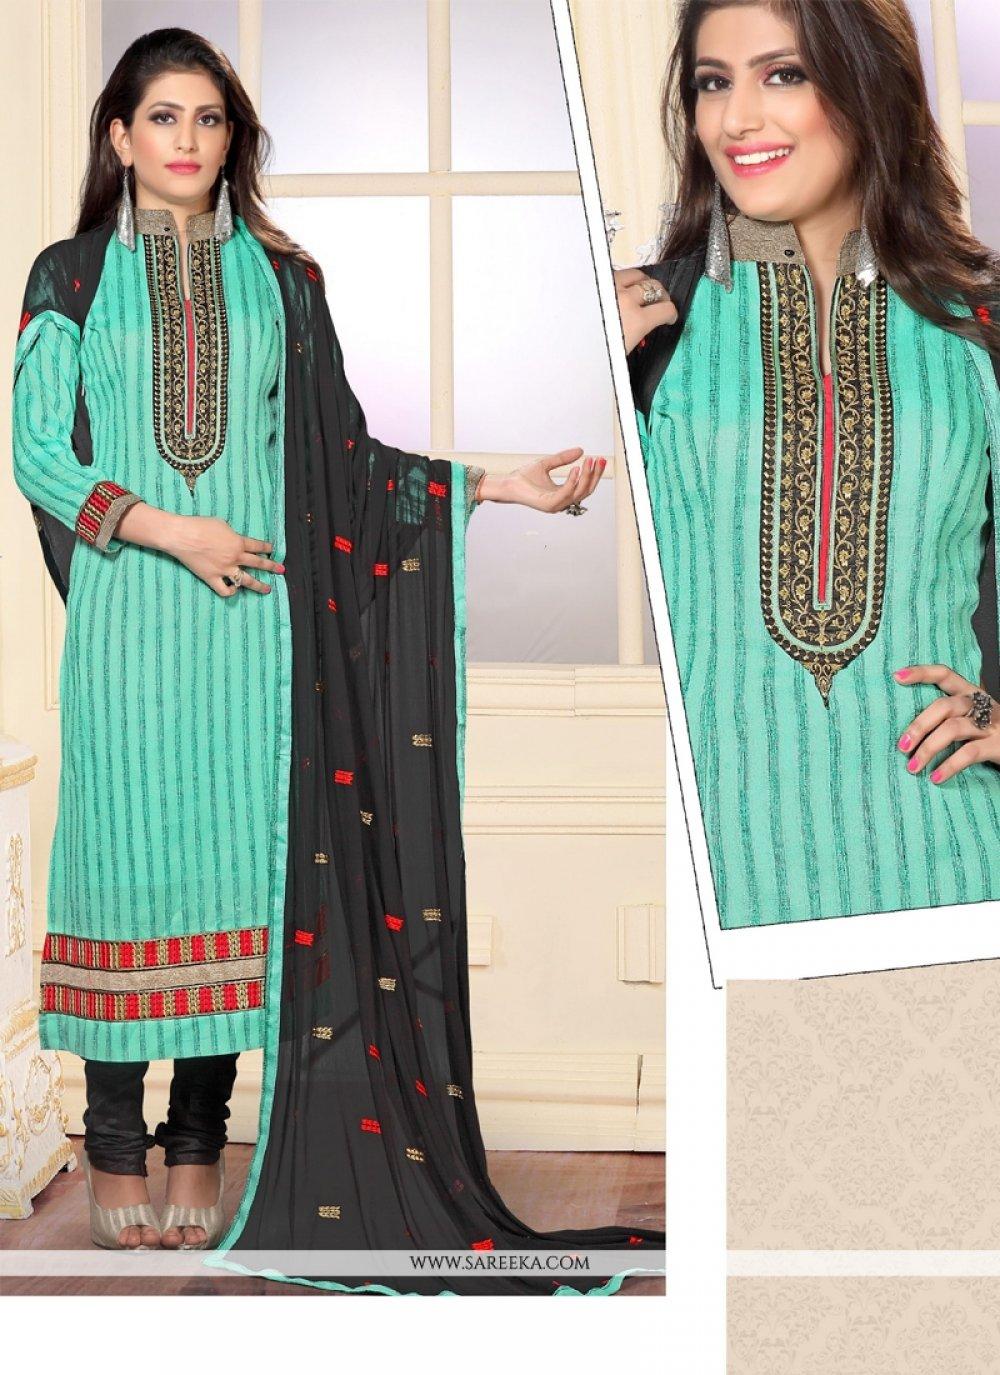 Resham Work Jute Silk Sea Green Designer Straight Salwar Kameez